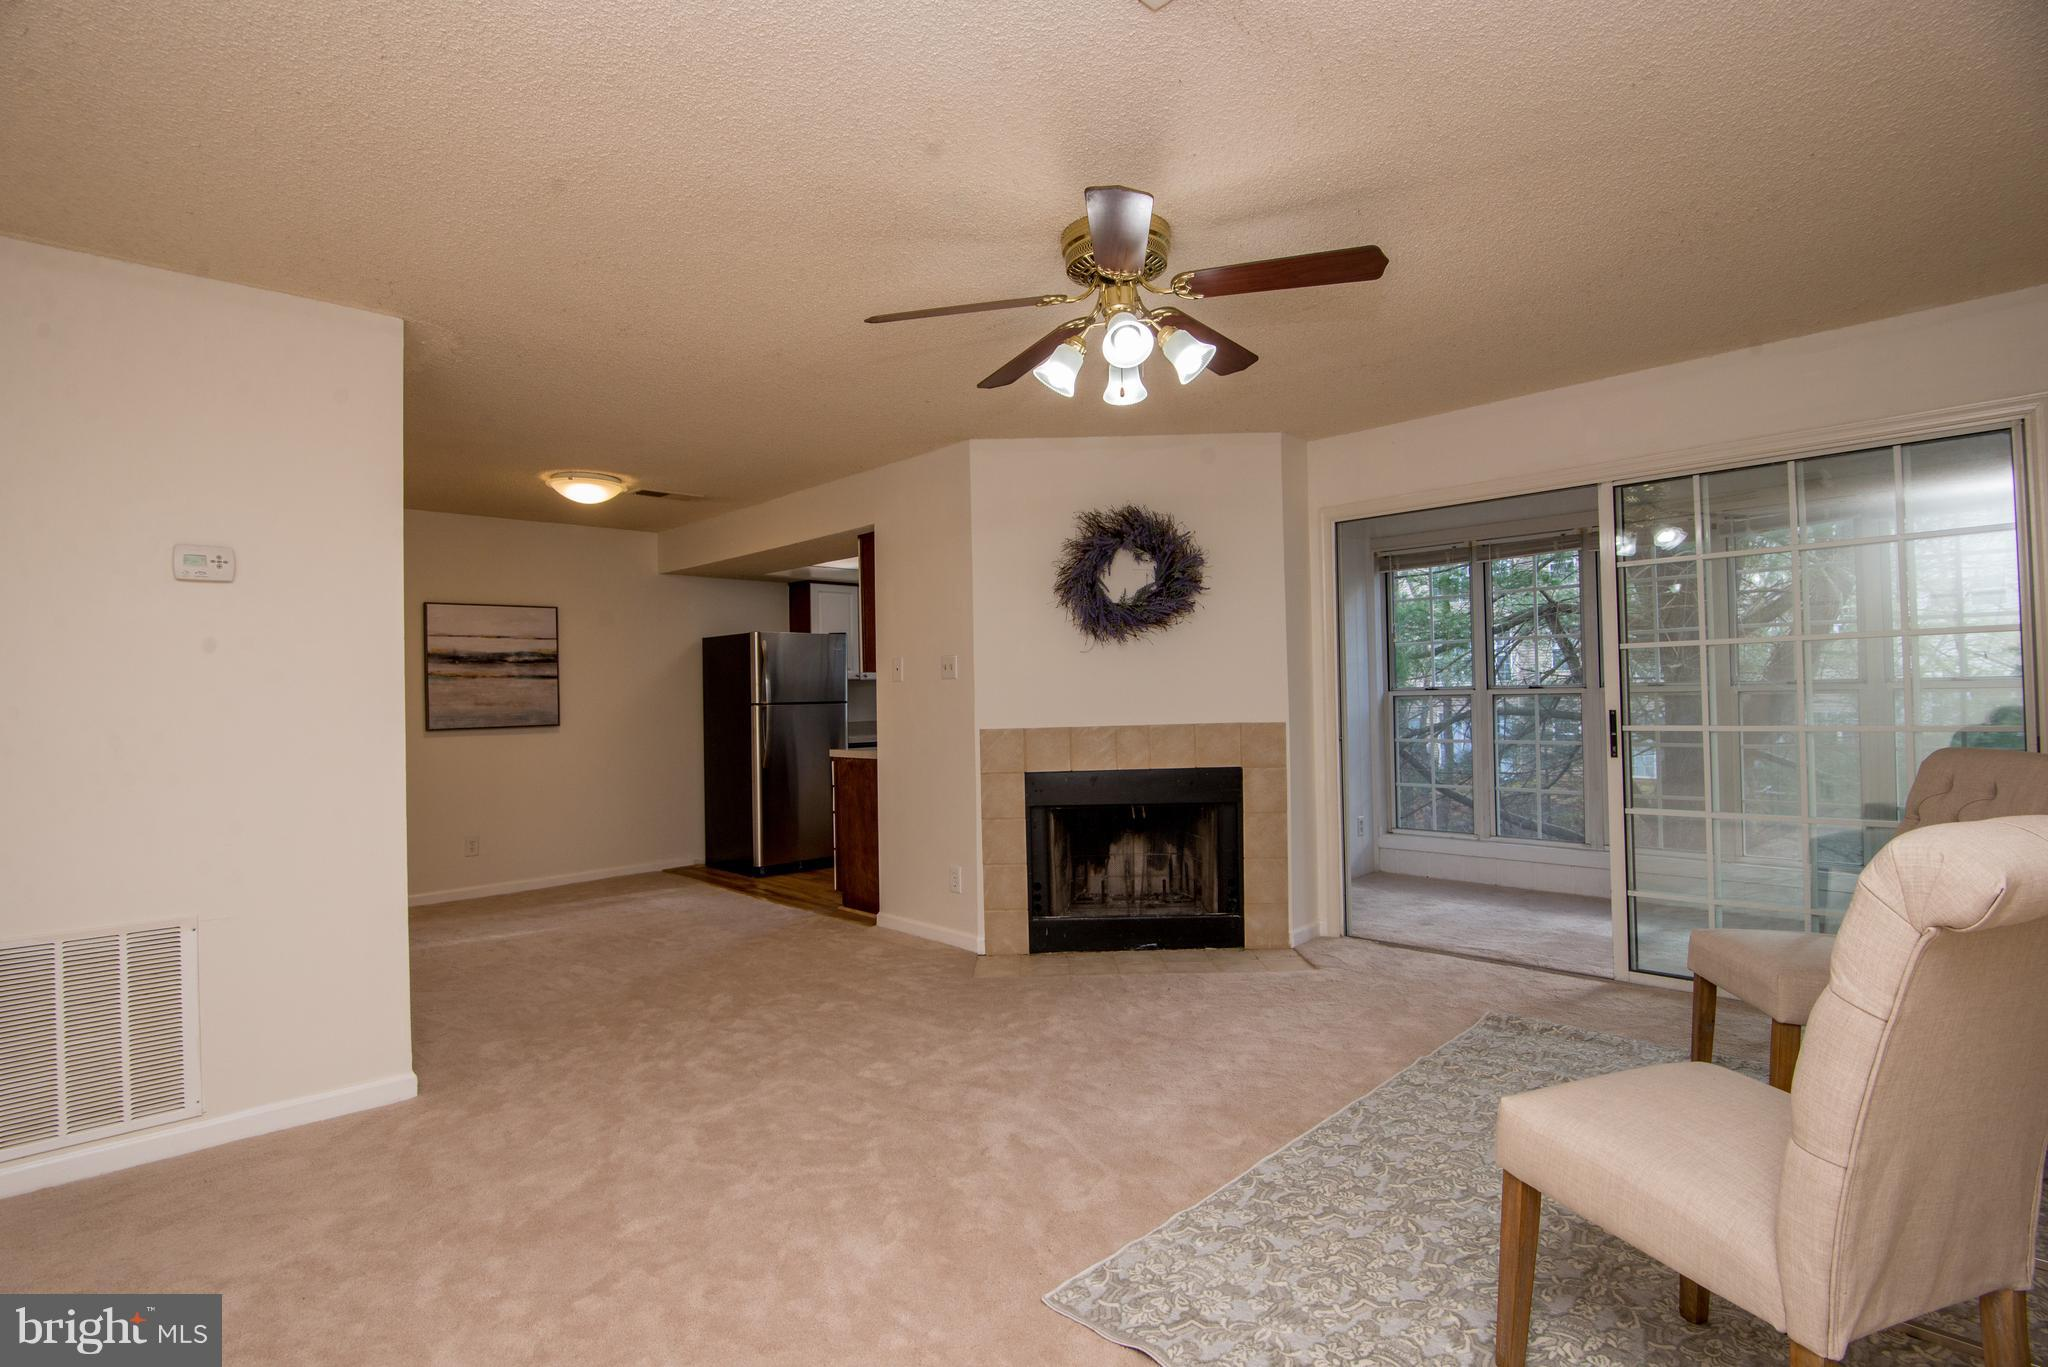 12105 GREEN LEDGE CT #201, Fairfax, VA 22033 $255,000 www